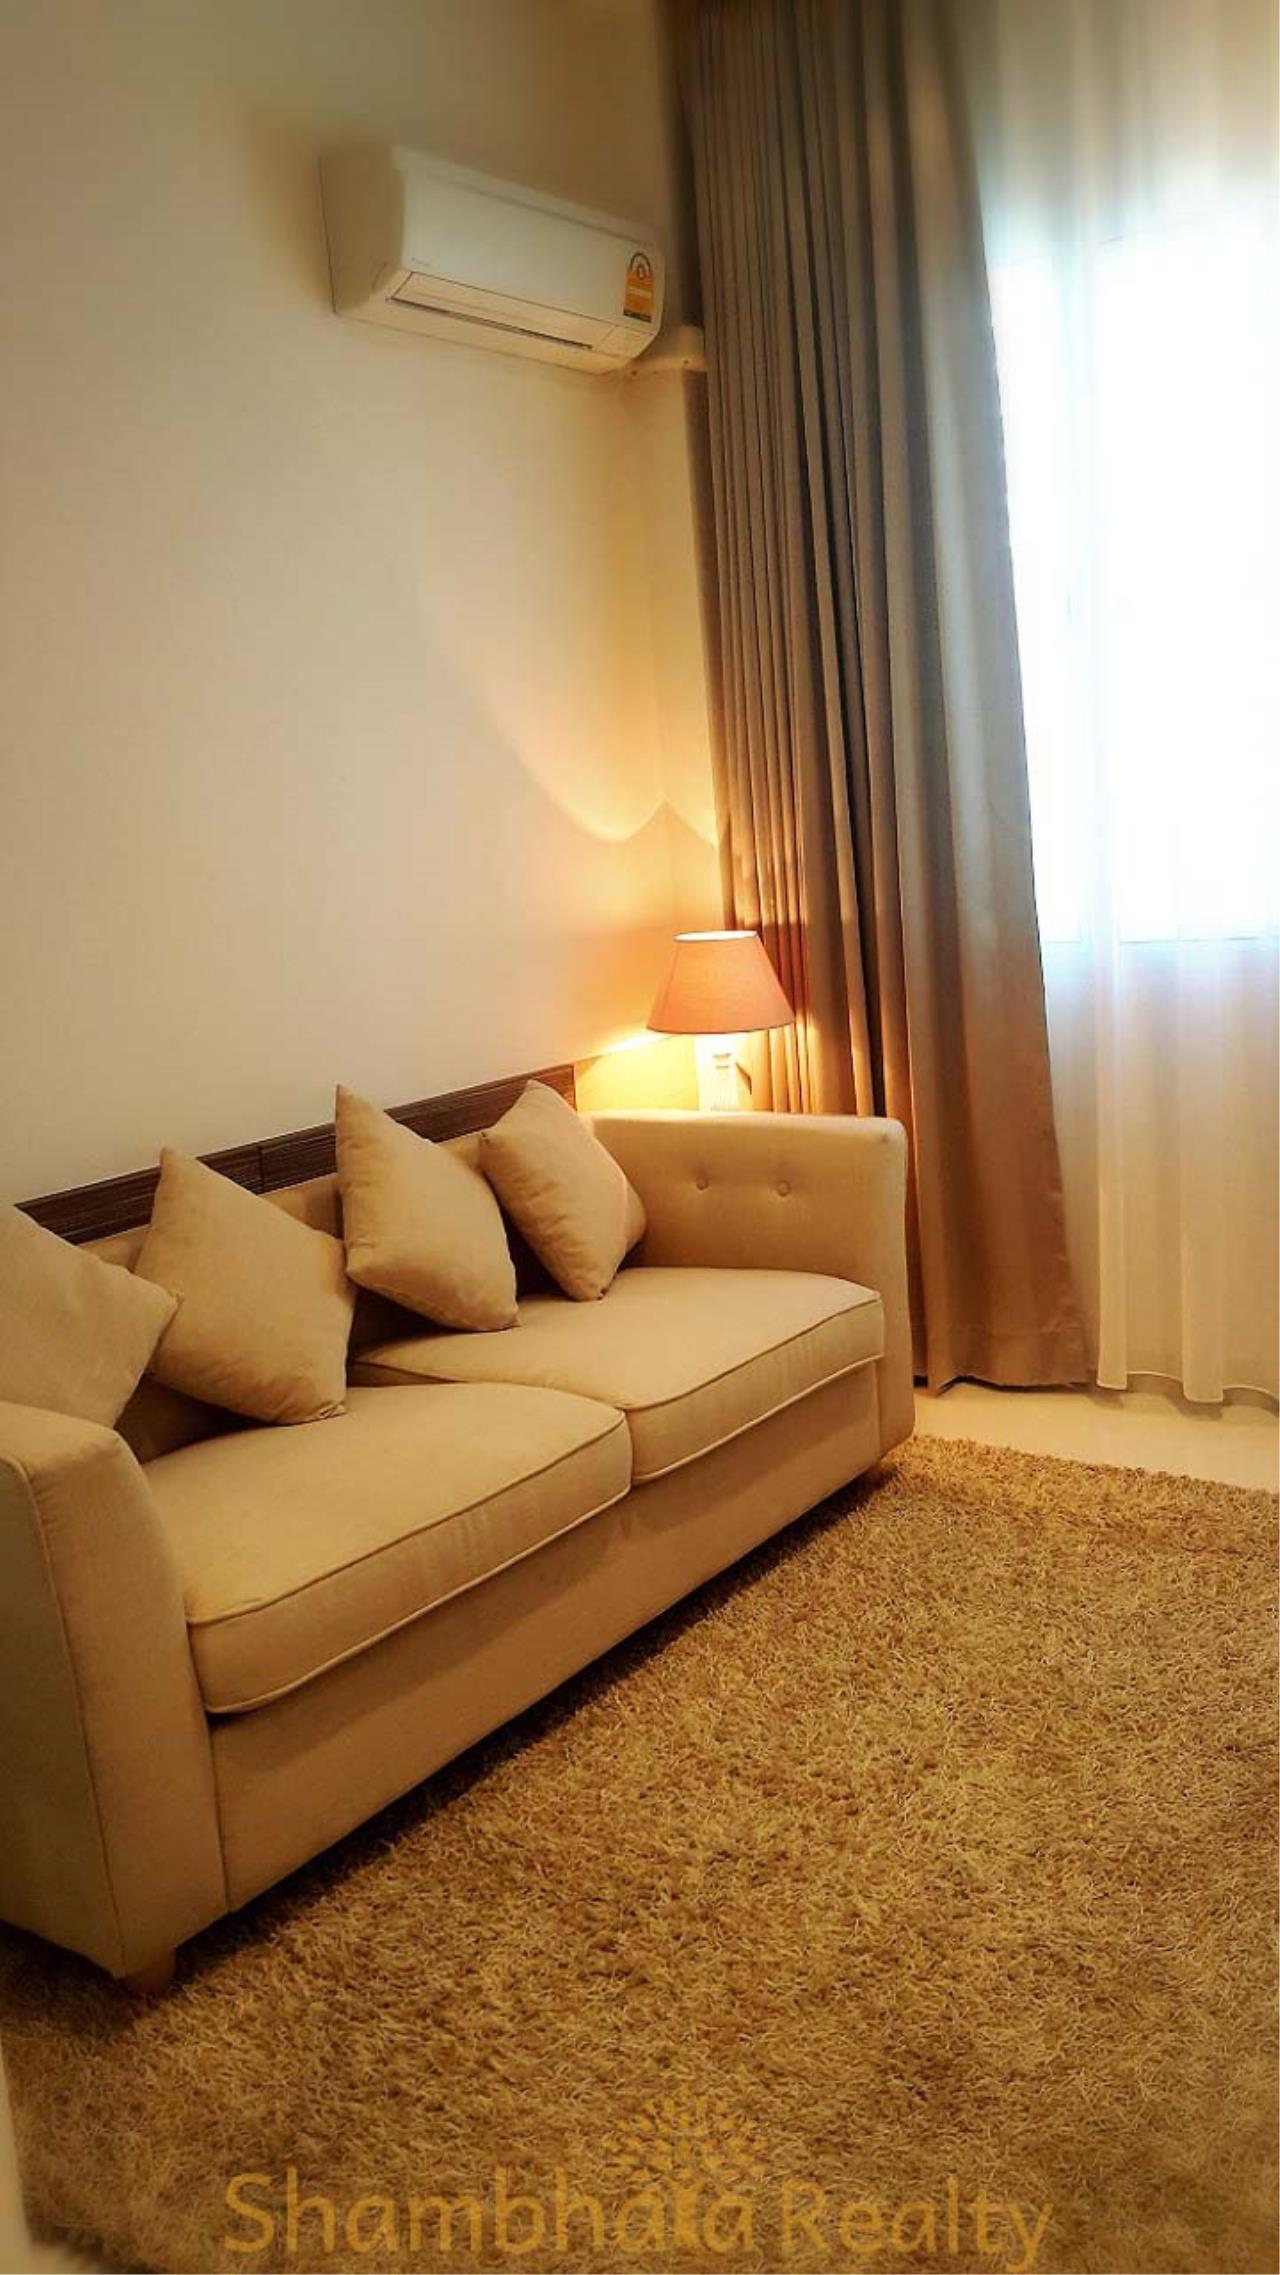 Shambhala Realty Agency's UR Thonglor Condominium for Rent in Thonglor 5